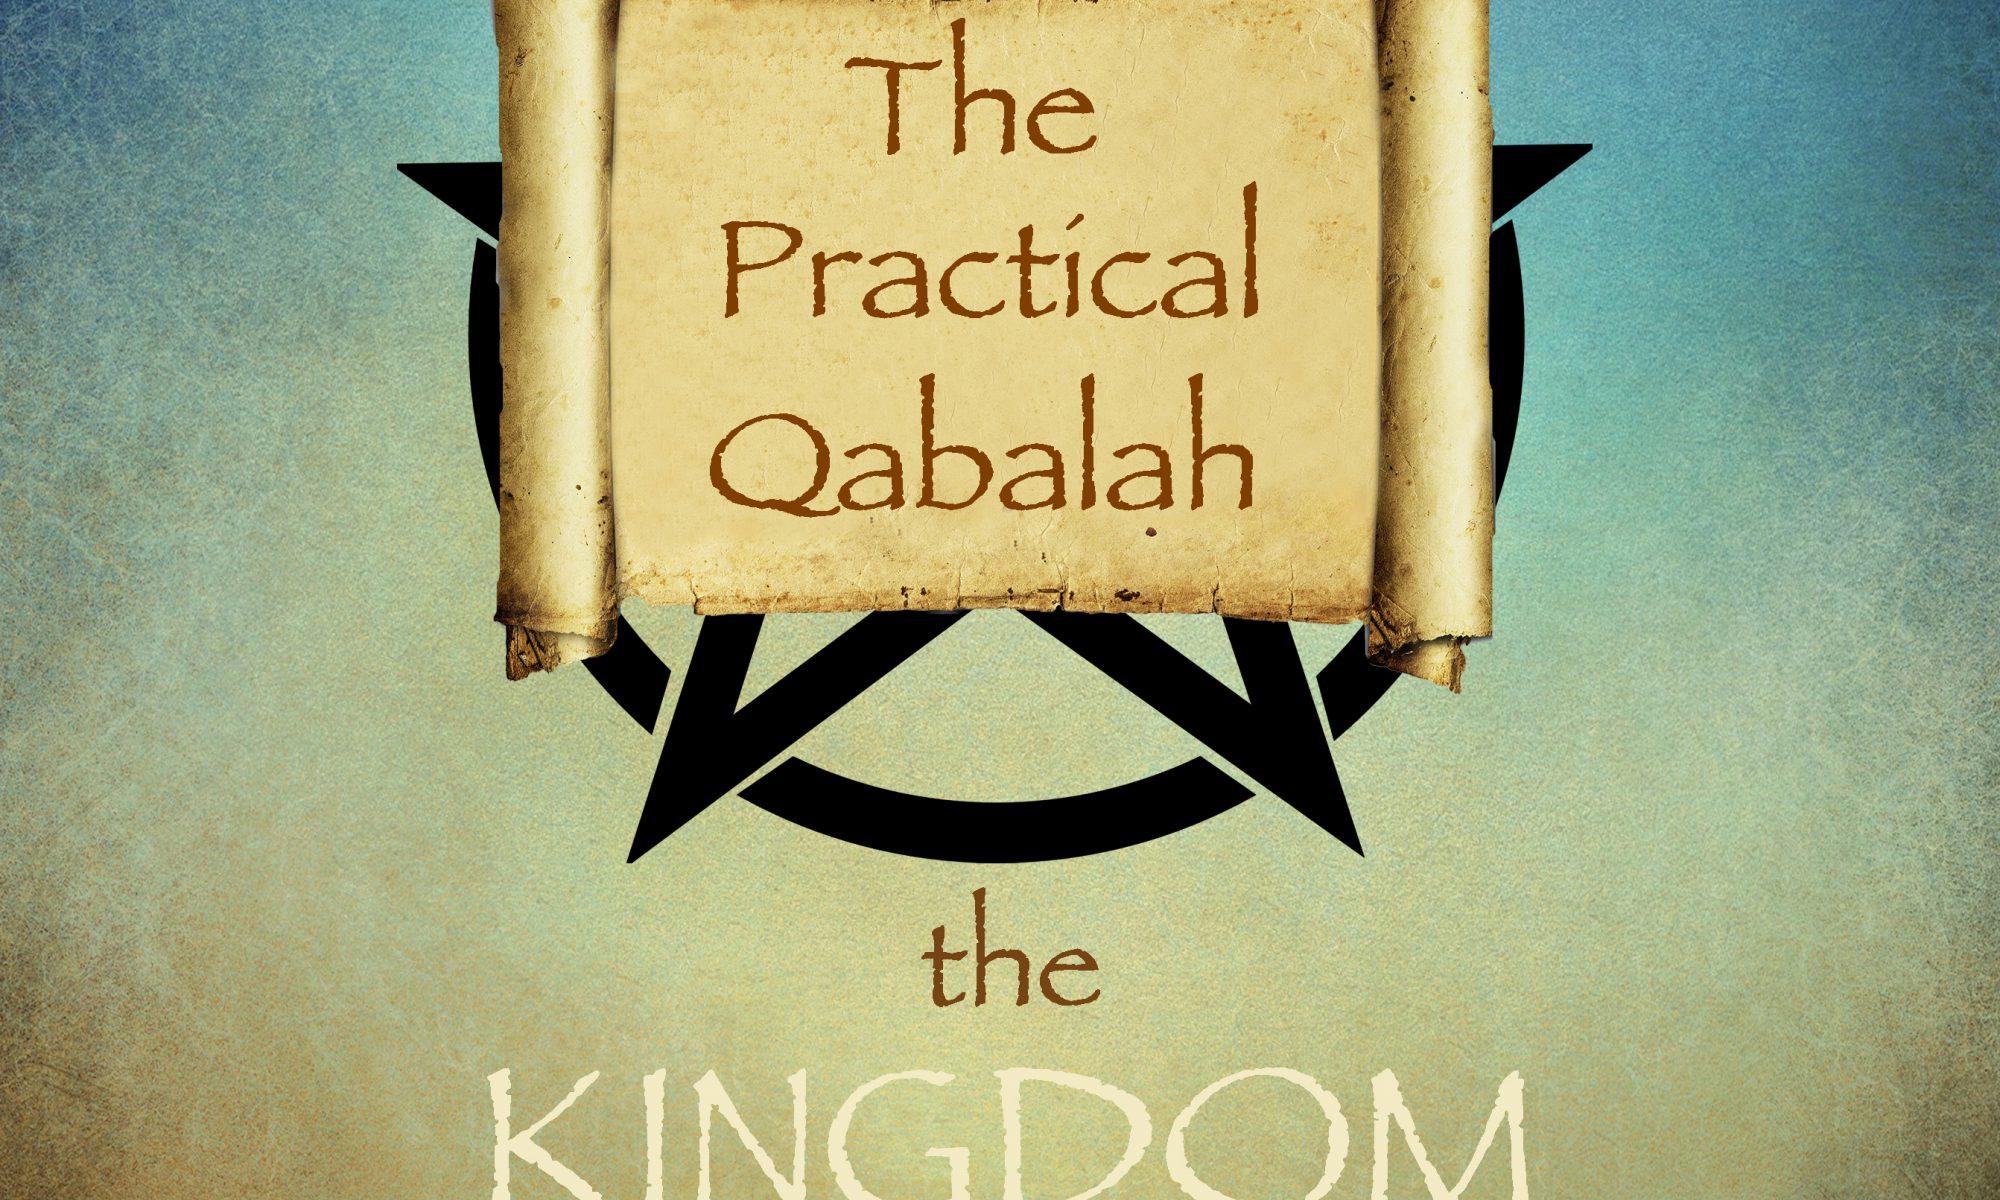 Malkuth - the Kingdom Qabalah front cover